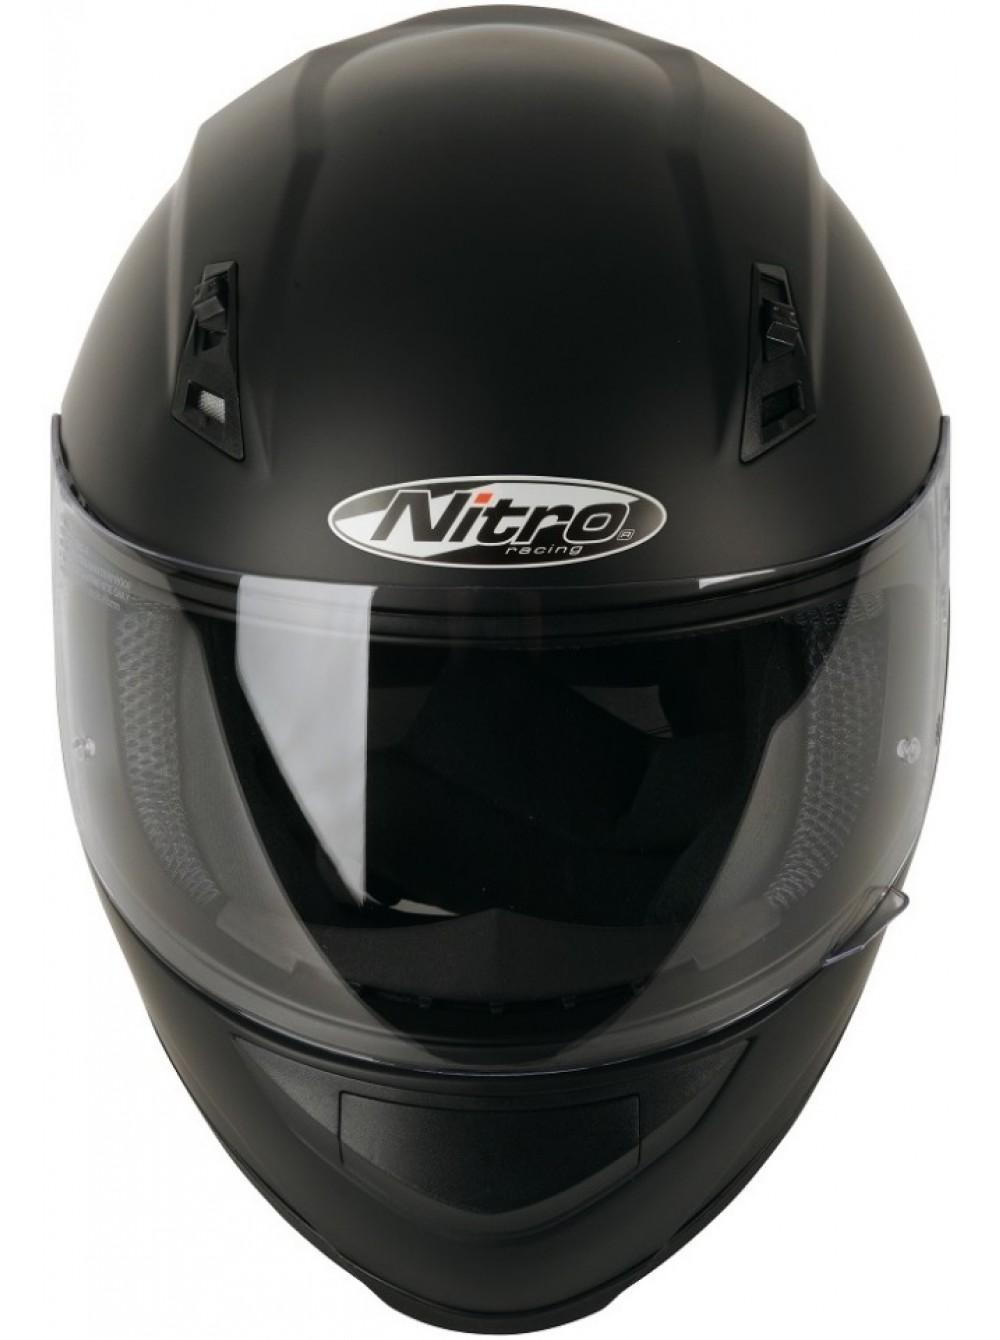 МОТОШЛЕМ NITRO N2000  Артмото - купить квадроцикл в украине и харькове, мотоцикл, снегоход, скутер, мопед, электромобиль